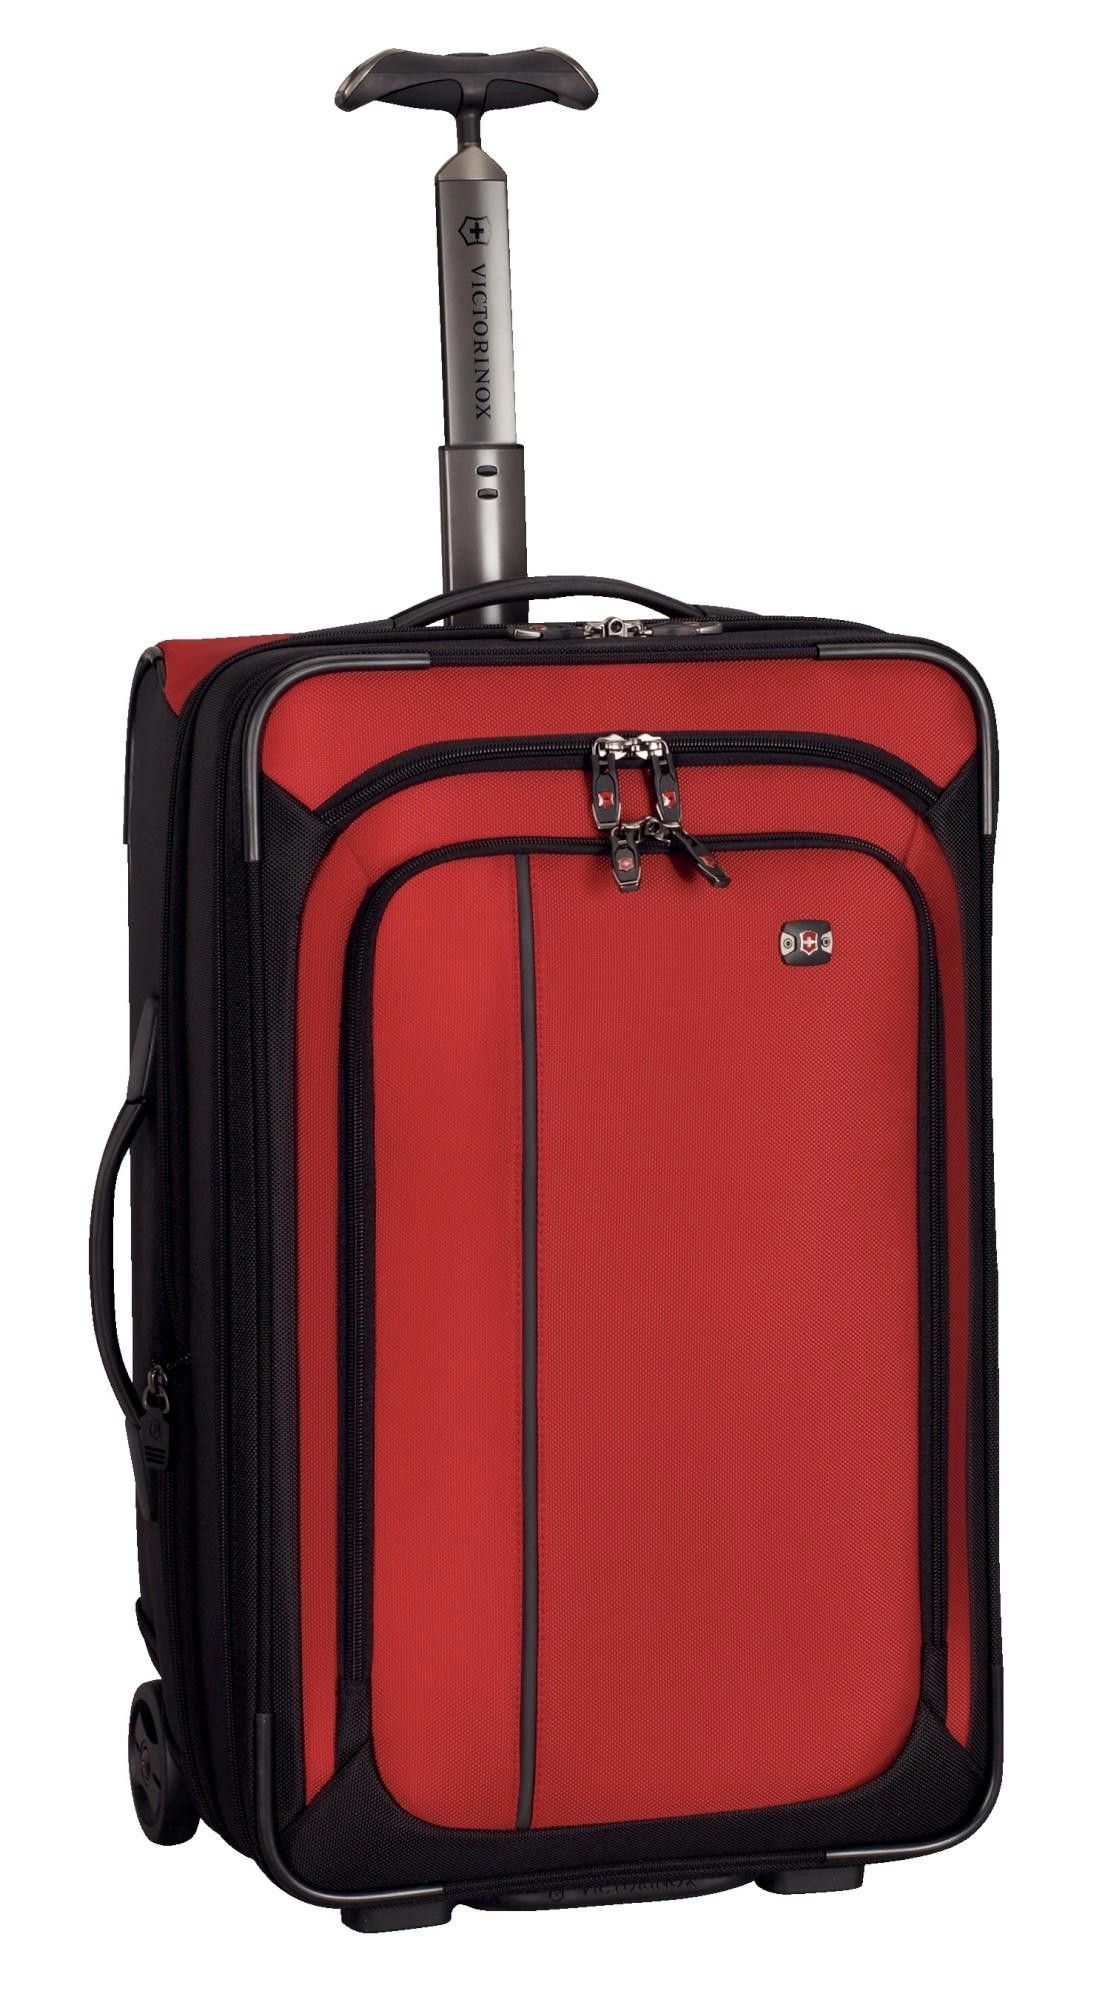 815819b71 Victorinox Werks Traveler 4.0 22